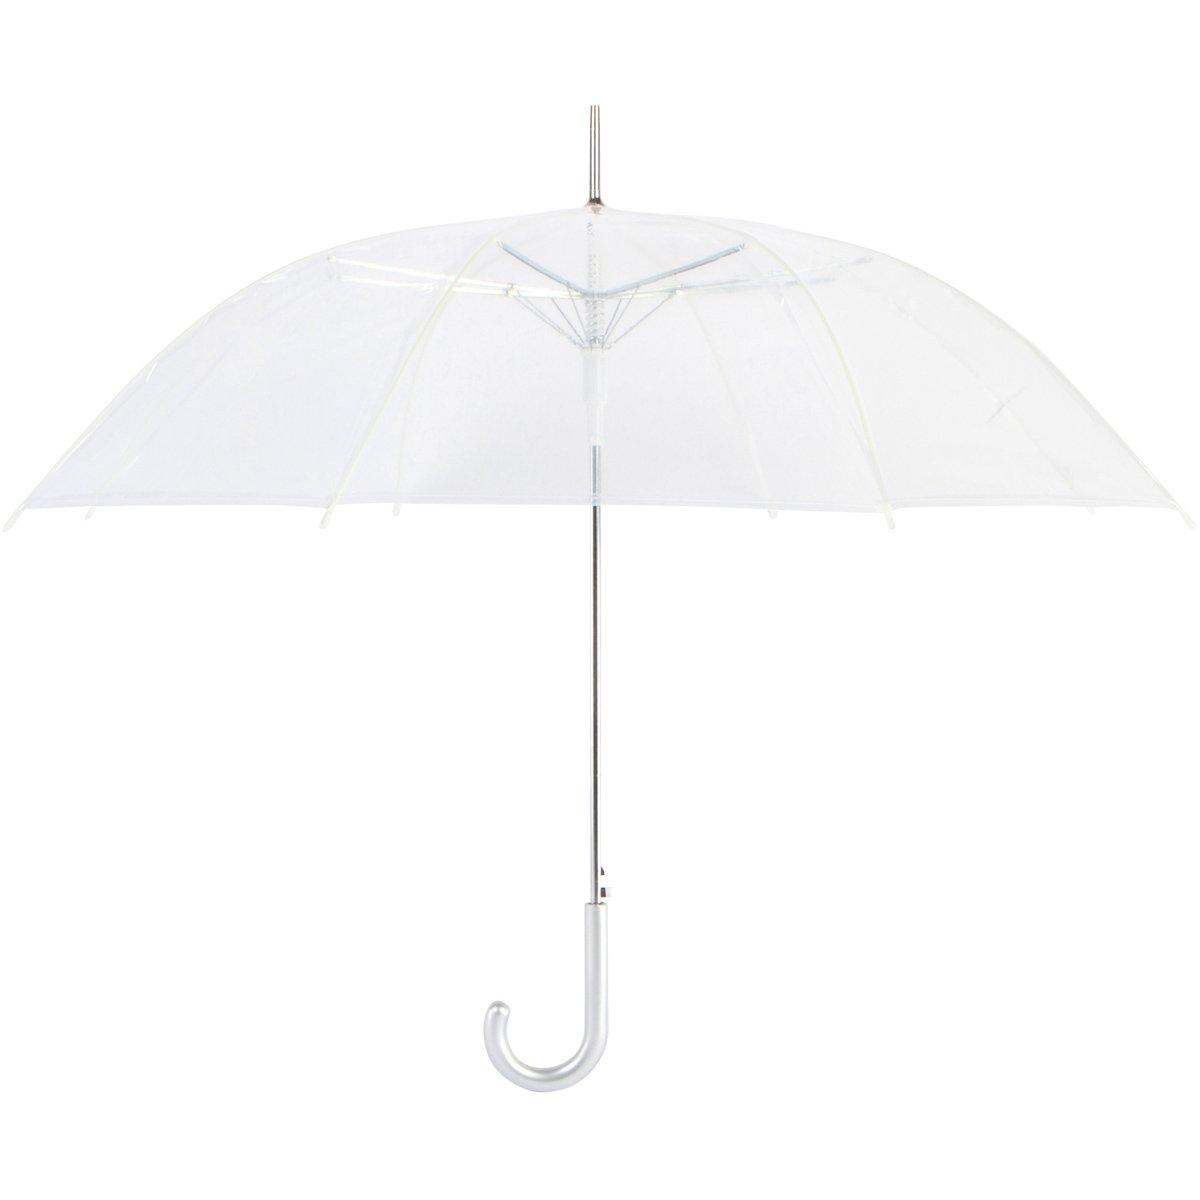 Cloak 10pk Auto Open Classic Clear Umbrellas by Cloak Umbrellas